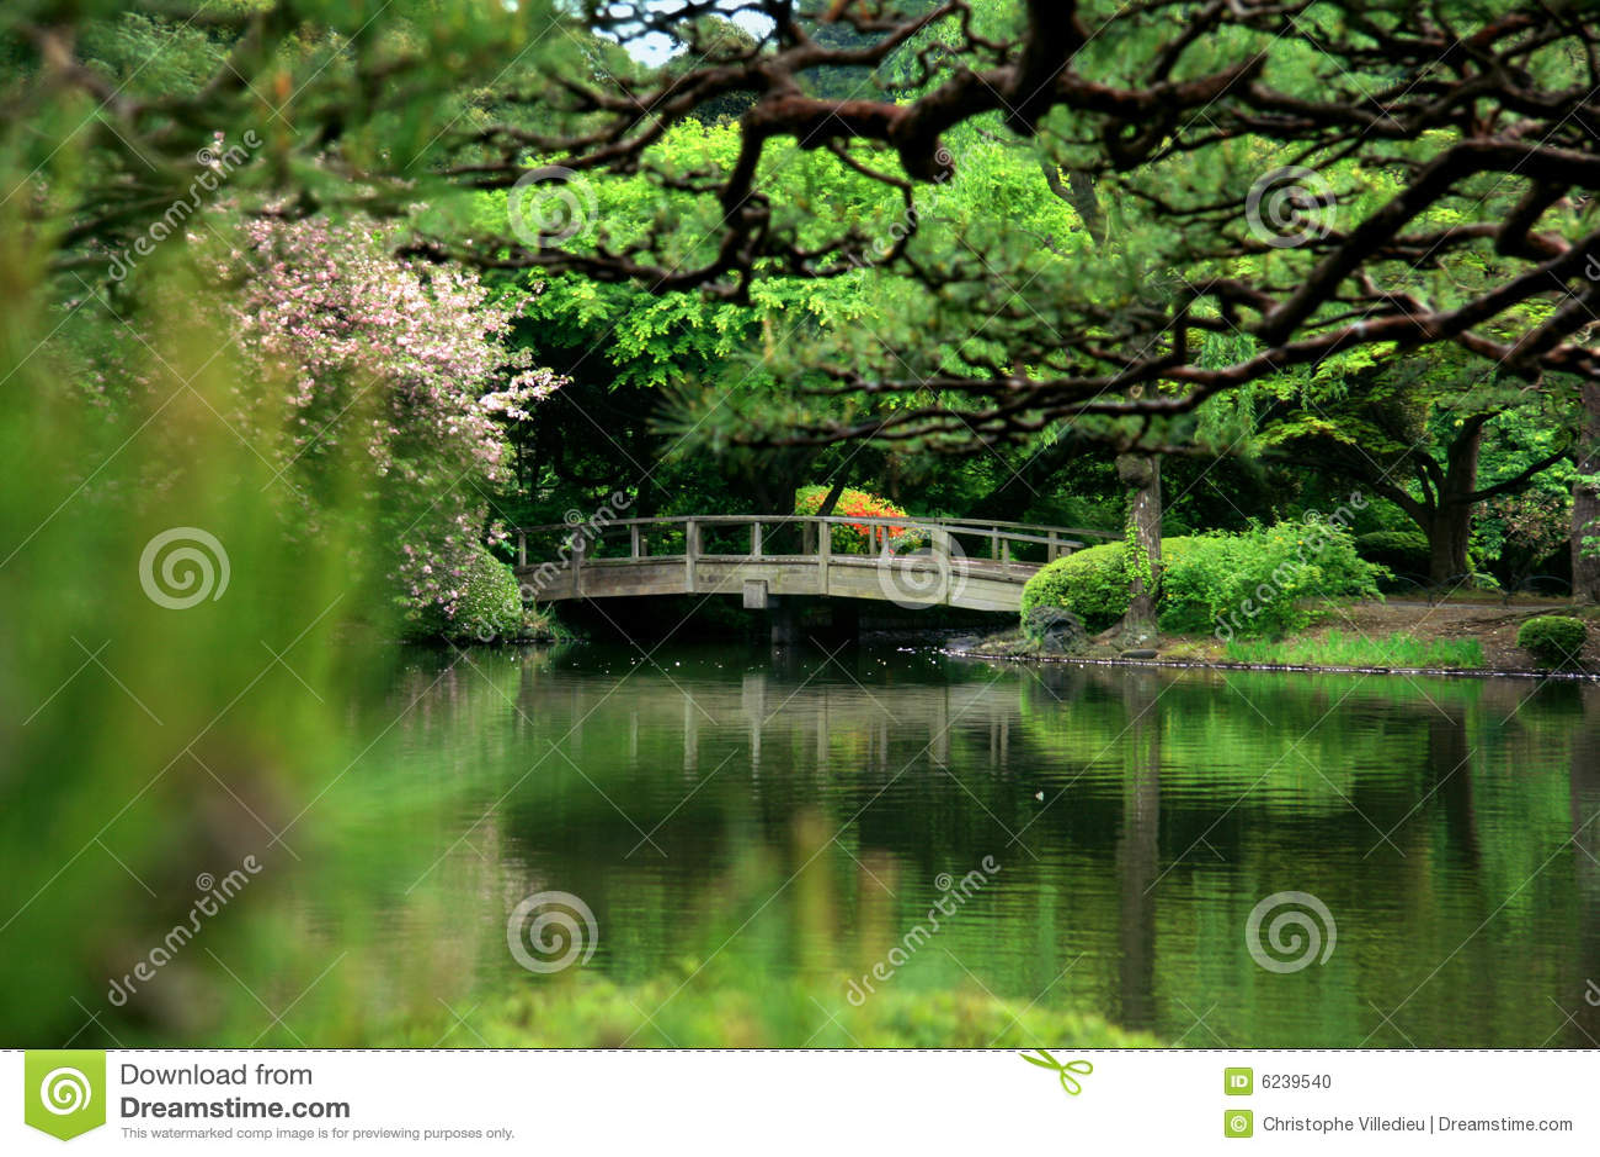 Cherry Blossom And Bridge In Calm Zen Garden Tokyo